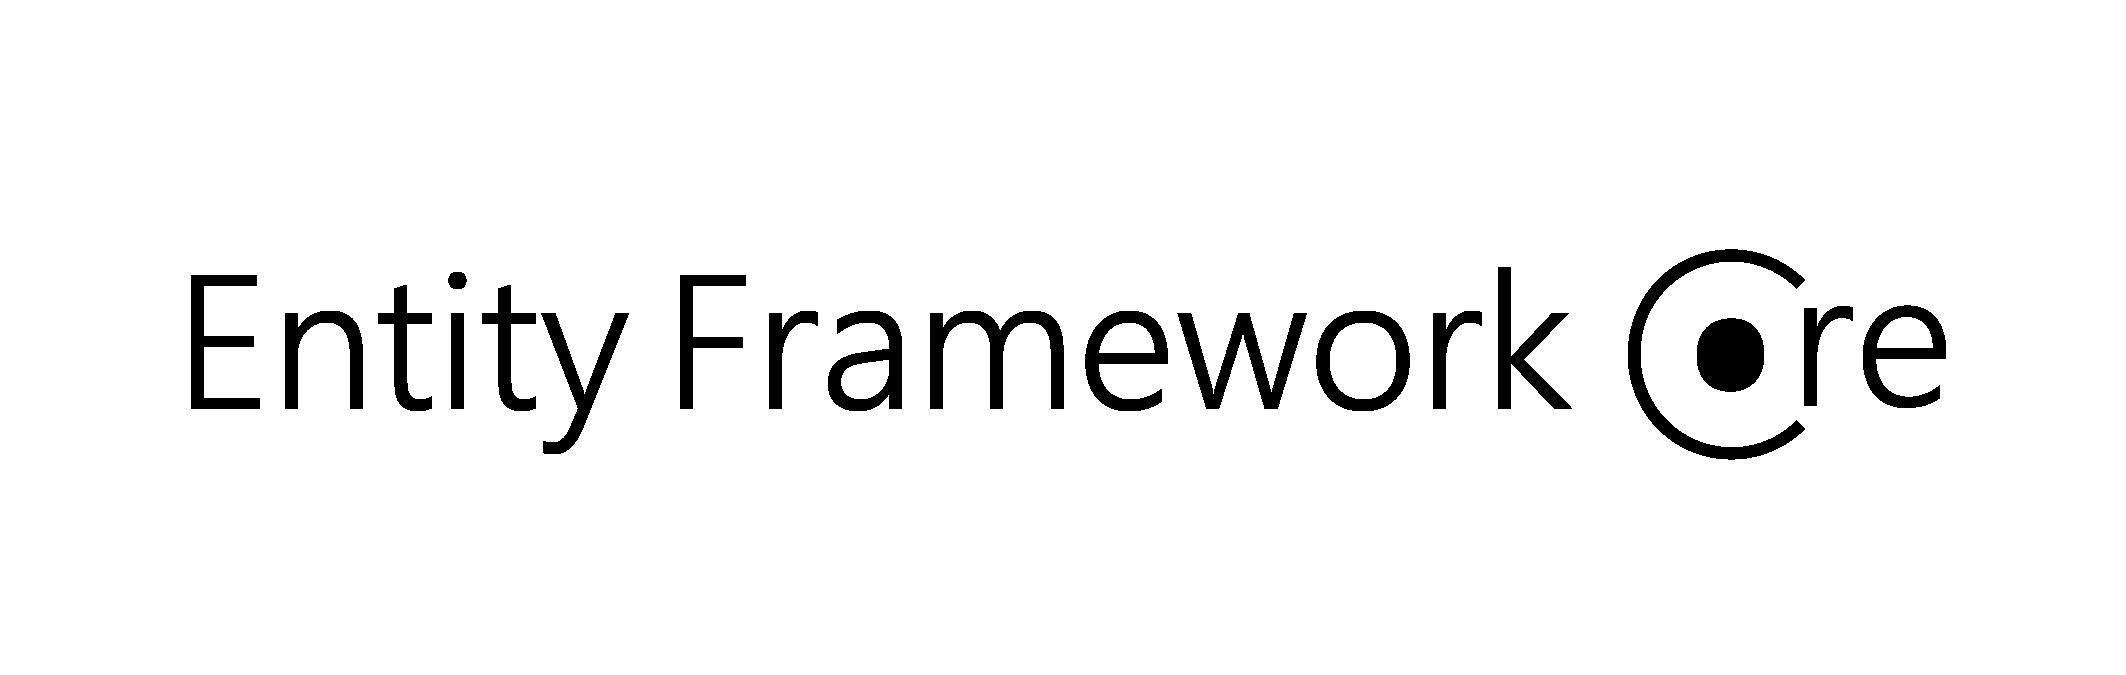 https://raw.githubusercontent.com/campusMVP/dotnetCoreLogoPack/master/Entity%20Framework%20Core/Bitmap%20RGB/Bitmap-BIG_Entity-Framework-Core-Logo_Black.png